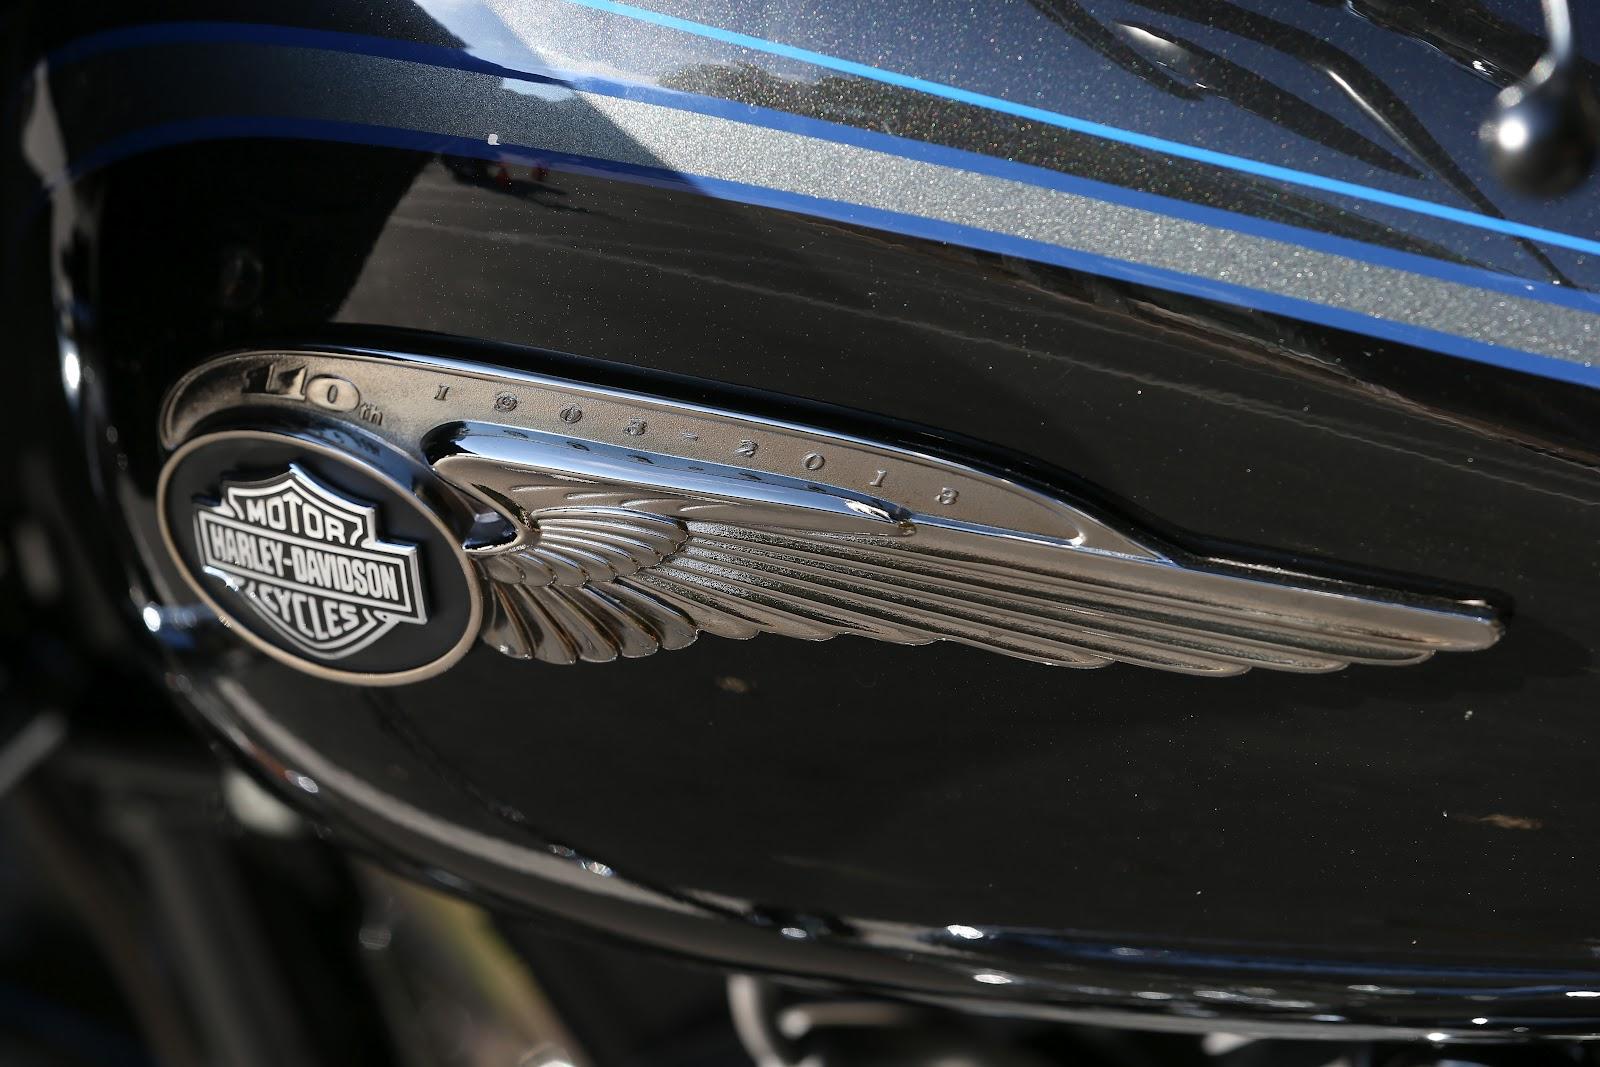 2013 Harley-Davidson CVO Models